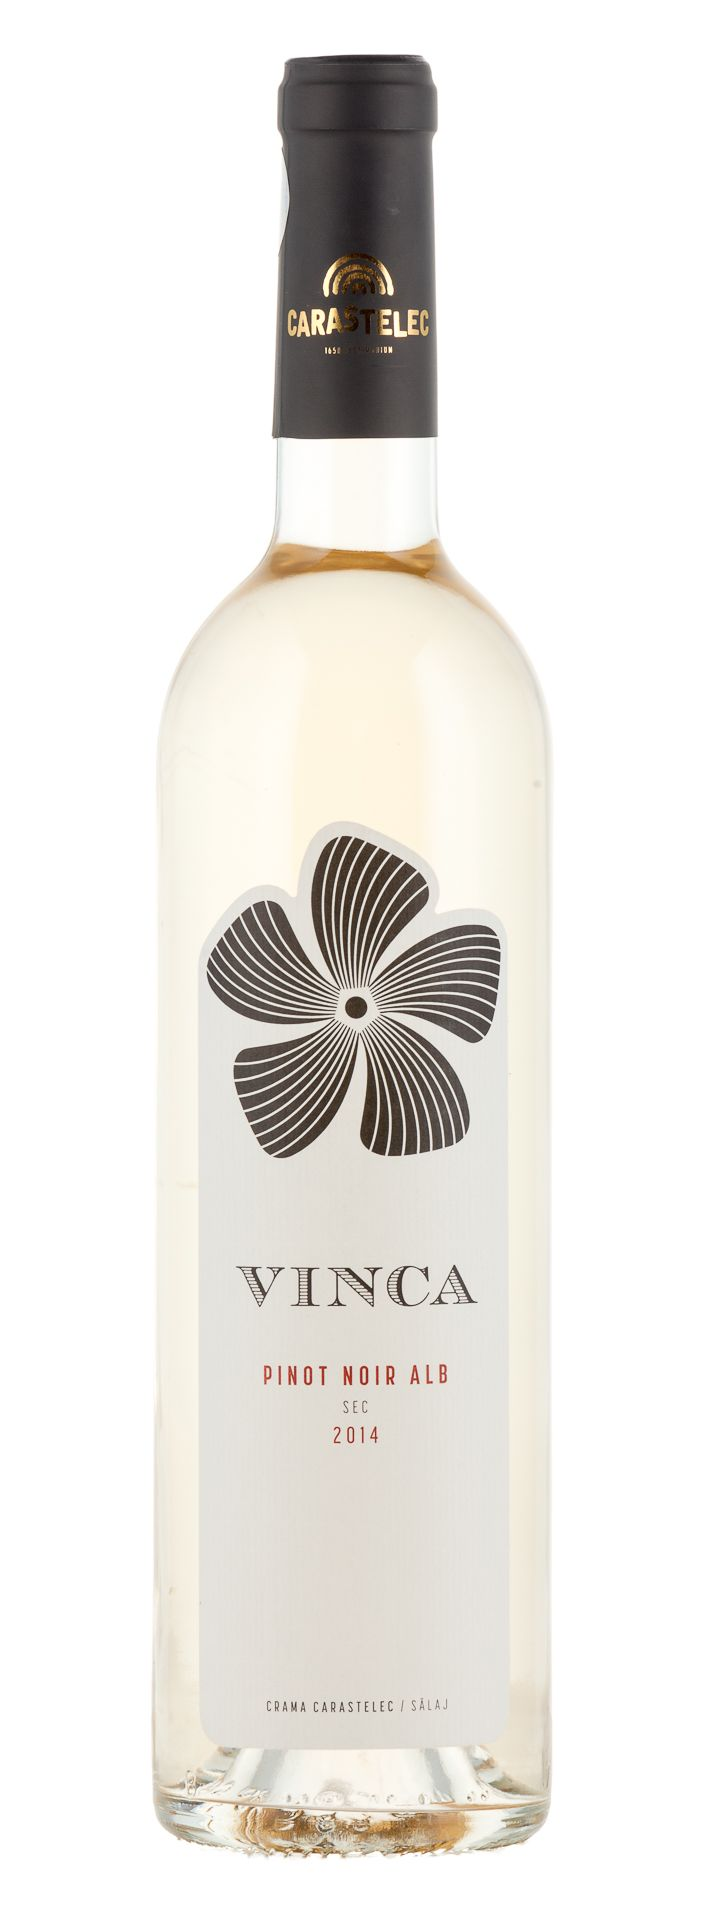 Blanc de Noir from Carastelec Winery 2014  #carastelec #winery #pinot noir #blanc de noir #romania #salaj #sparkling #vinca #friza